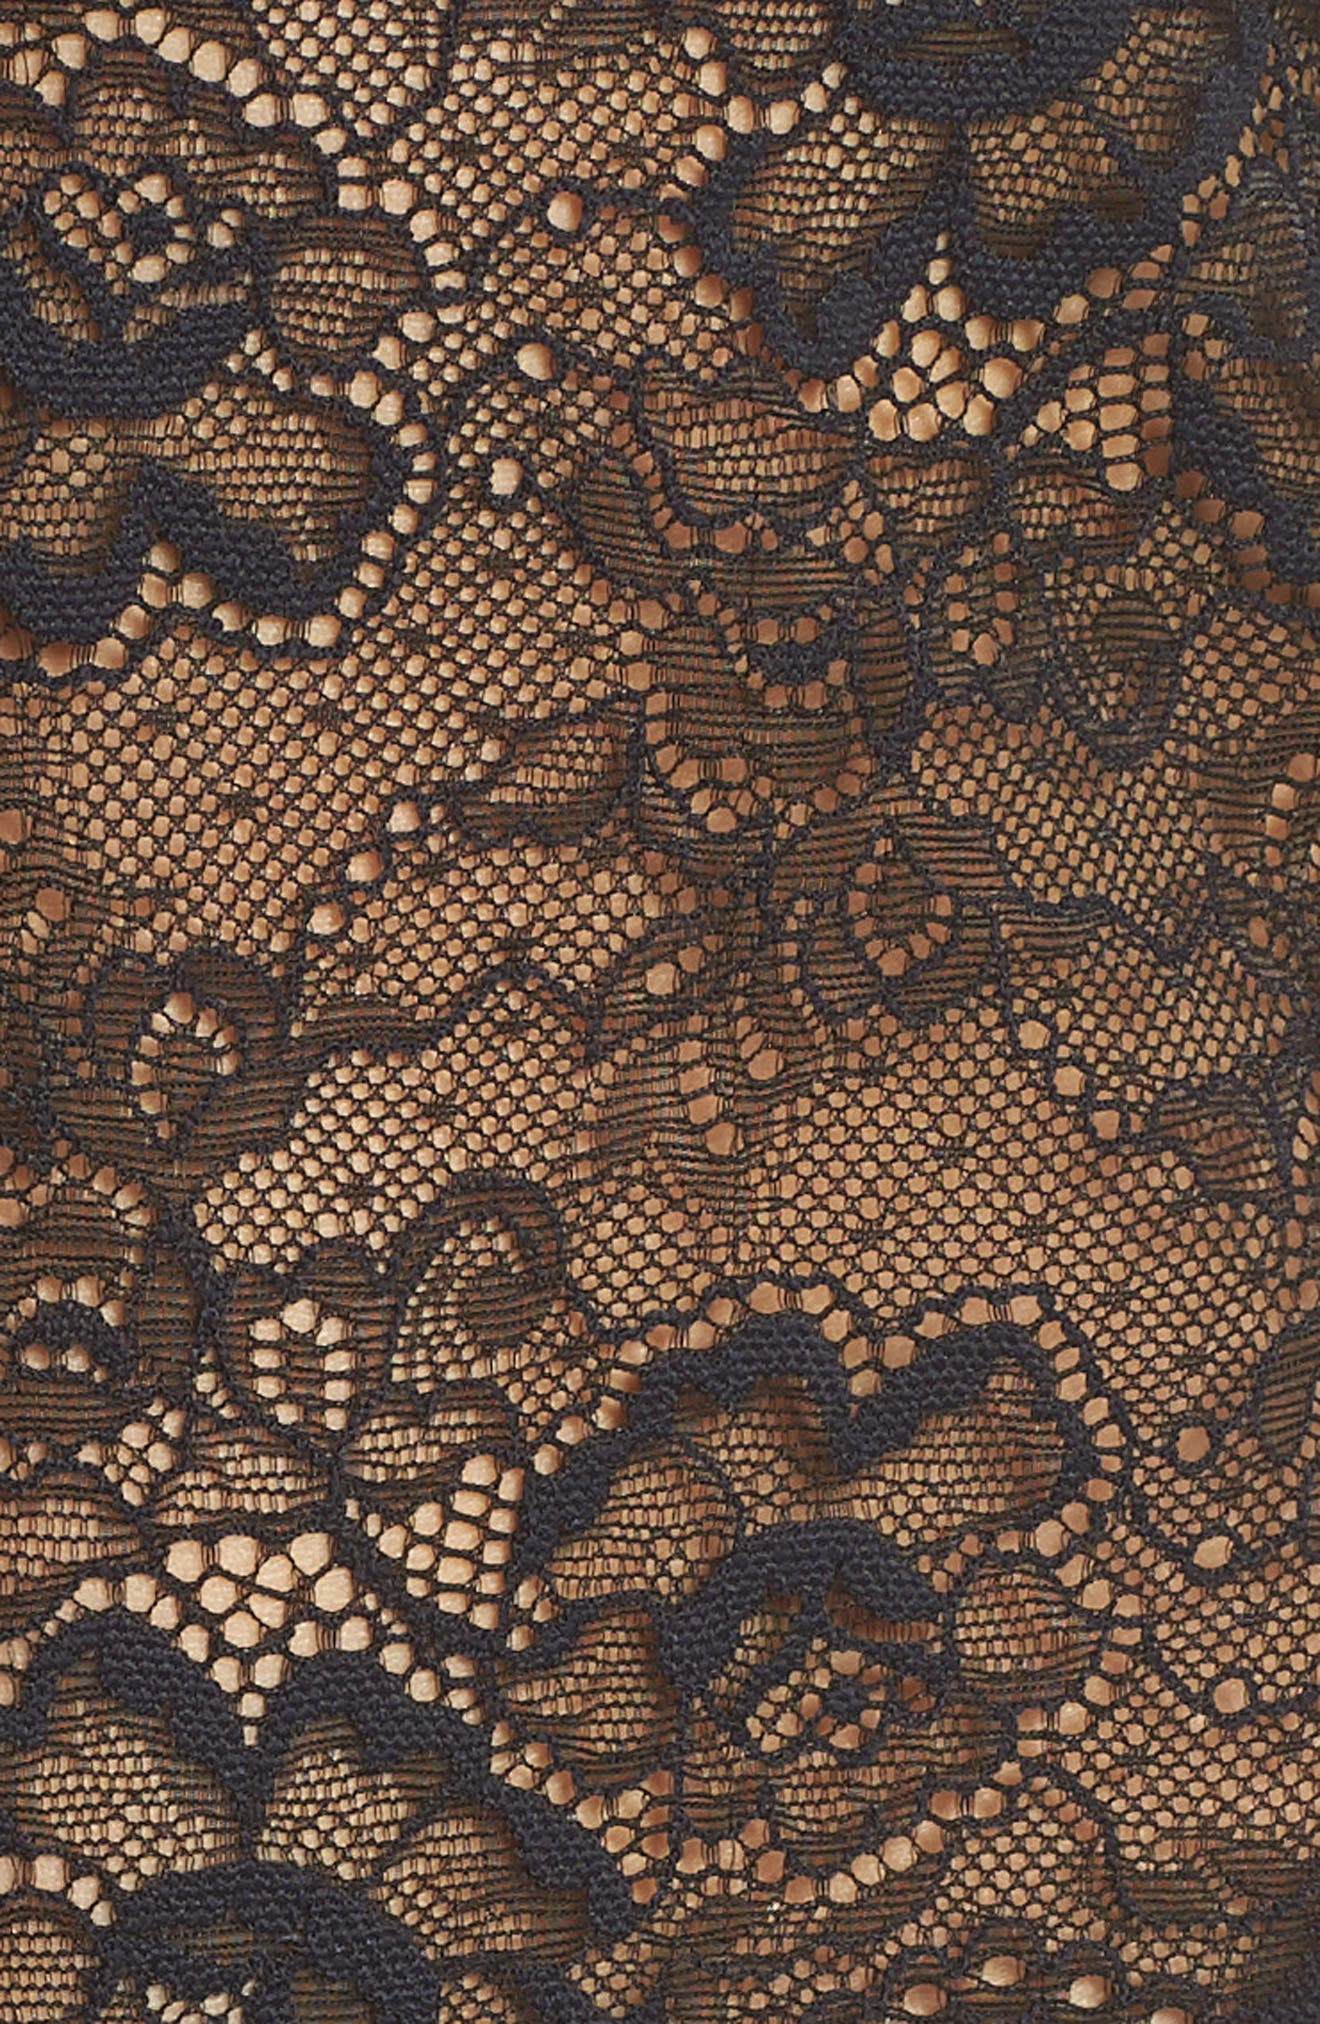 Lace Chemise,                             Alternate thumbnail 5, color,                             Black